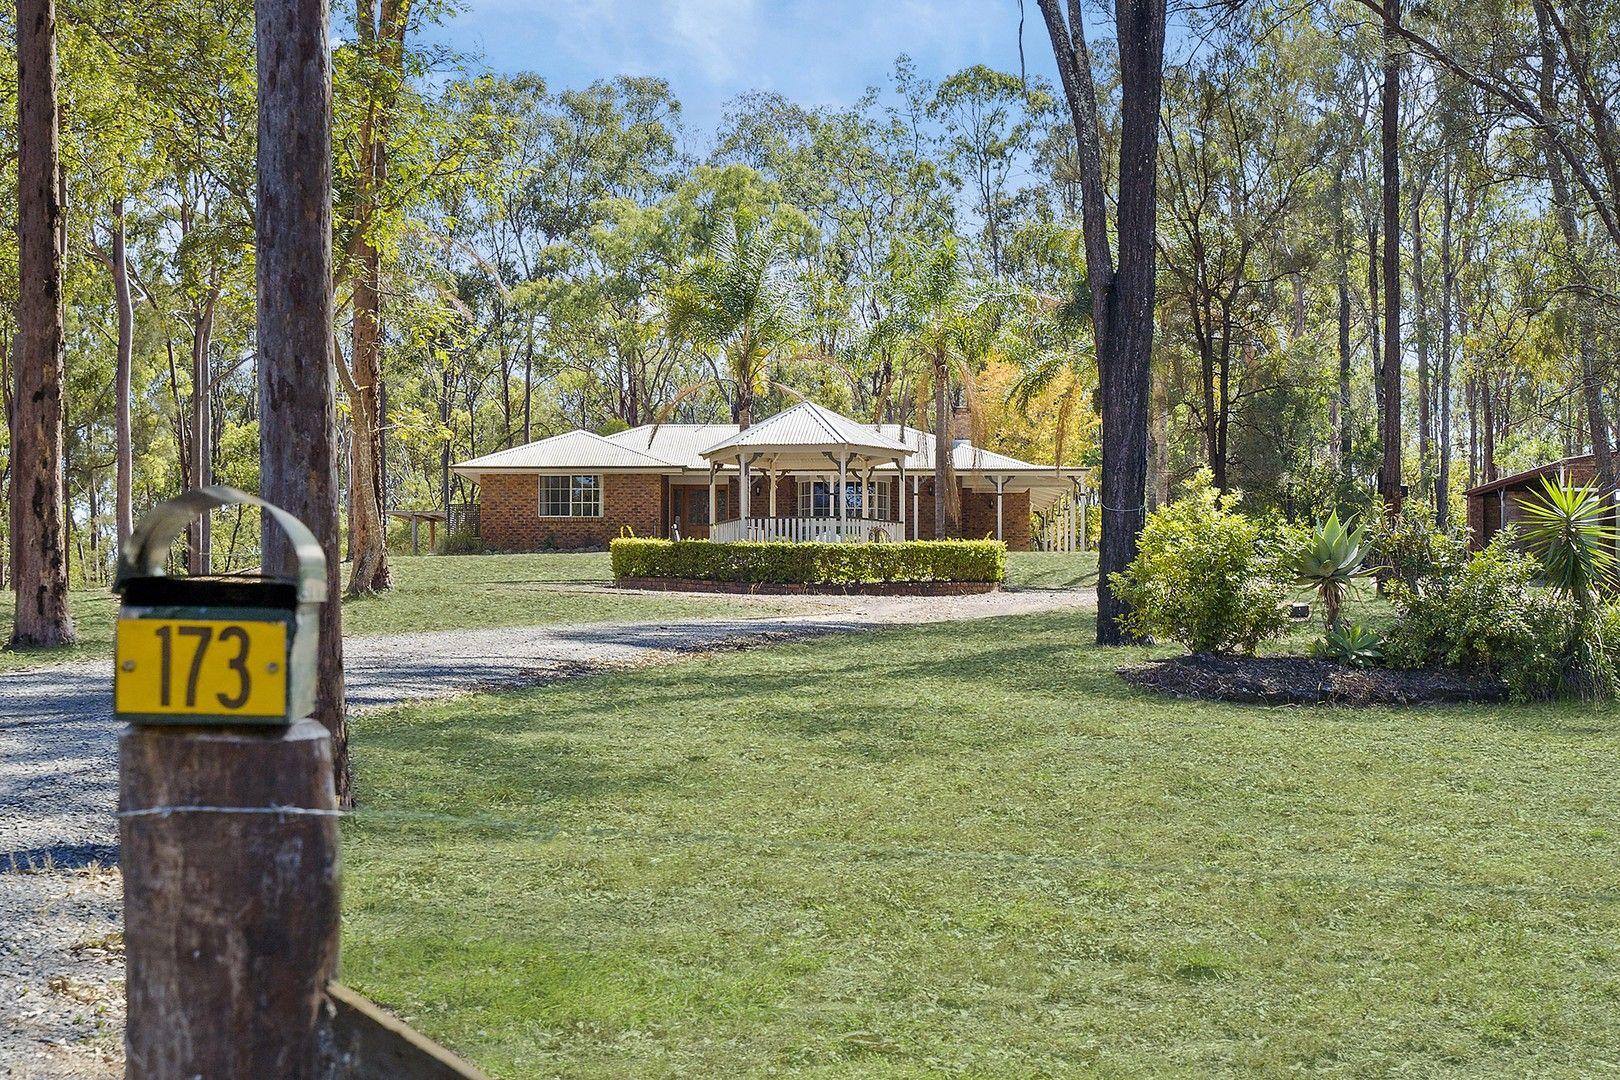 173-175 Binnies Road, Ripley QLD 4306, Image 0